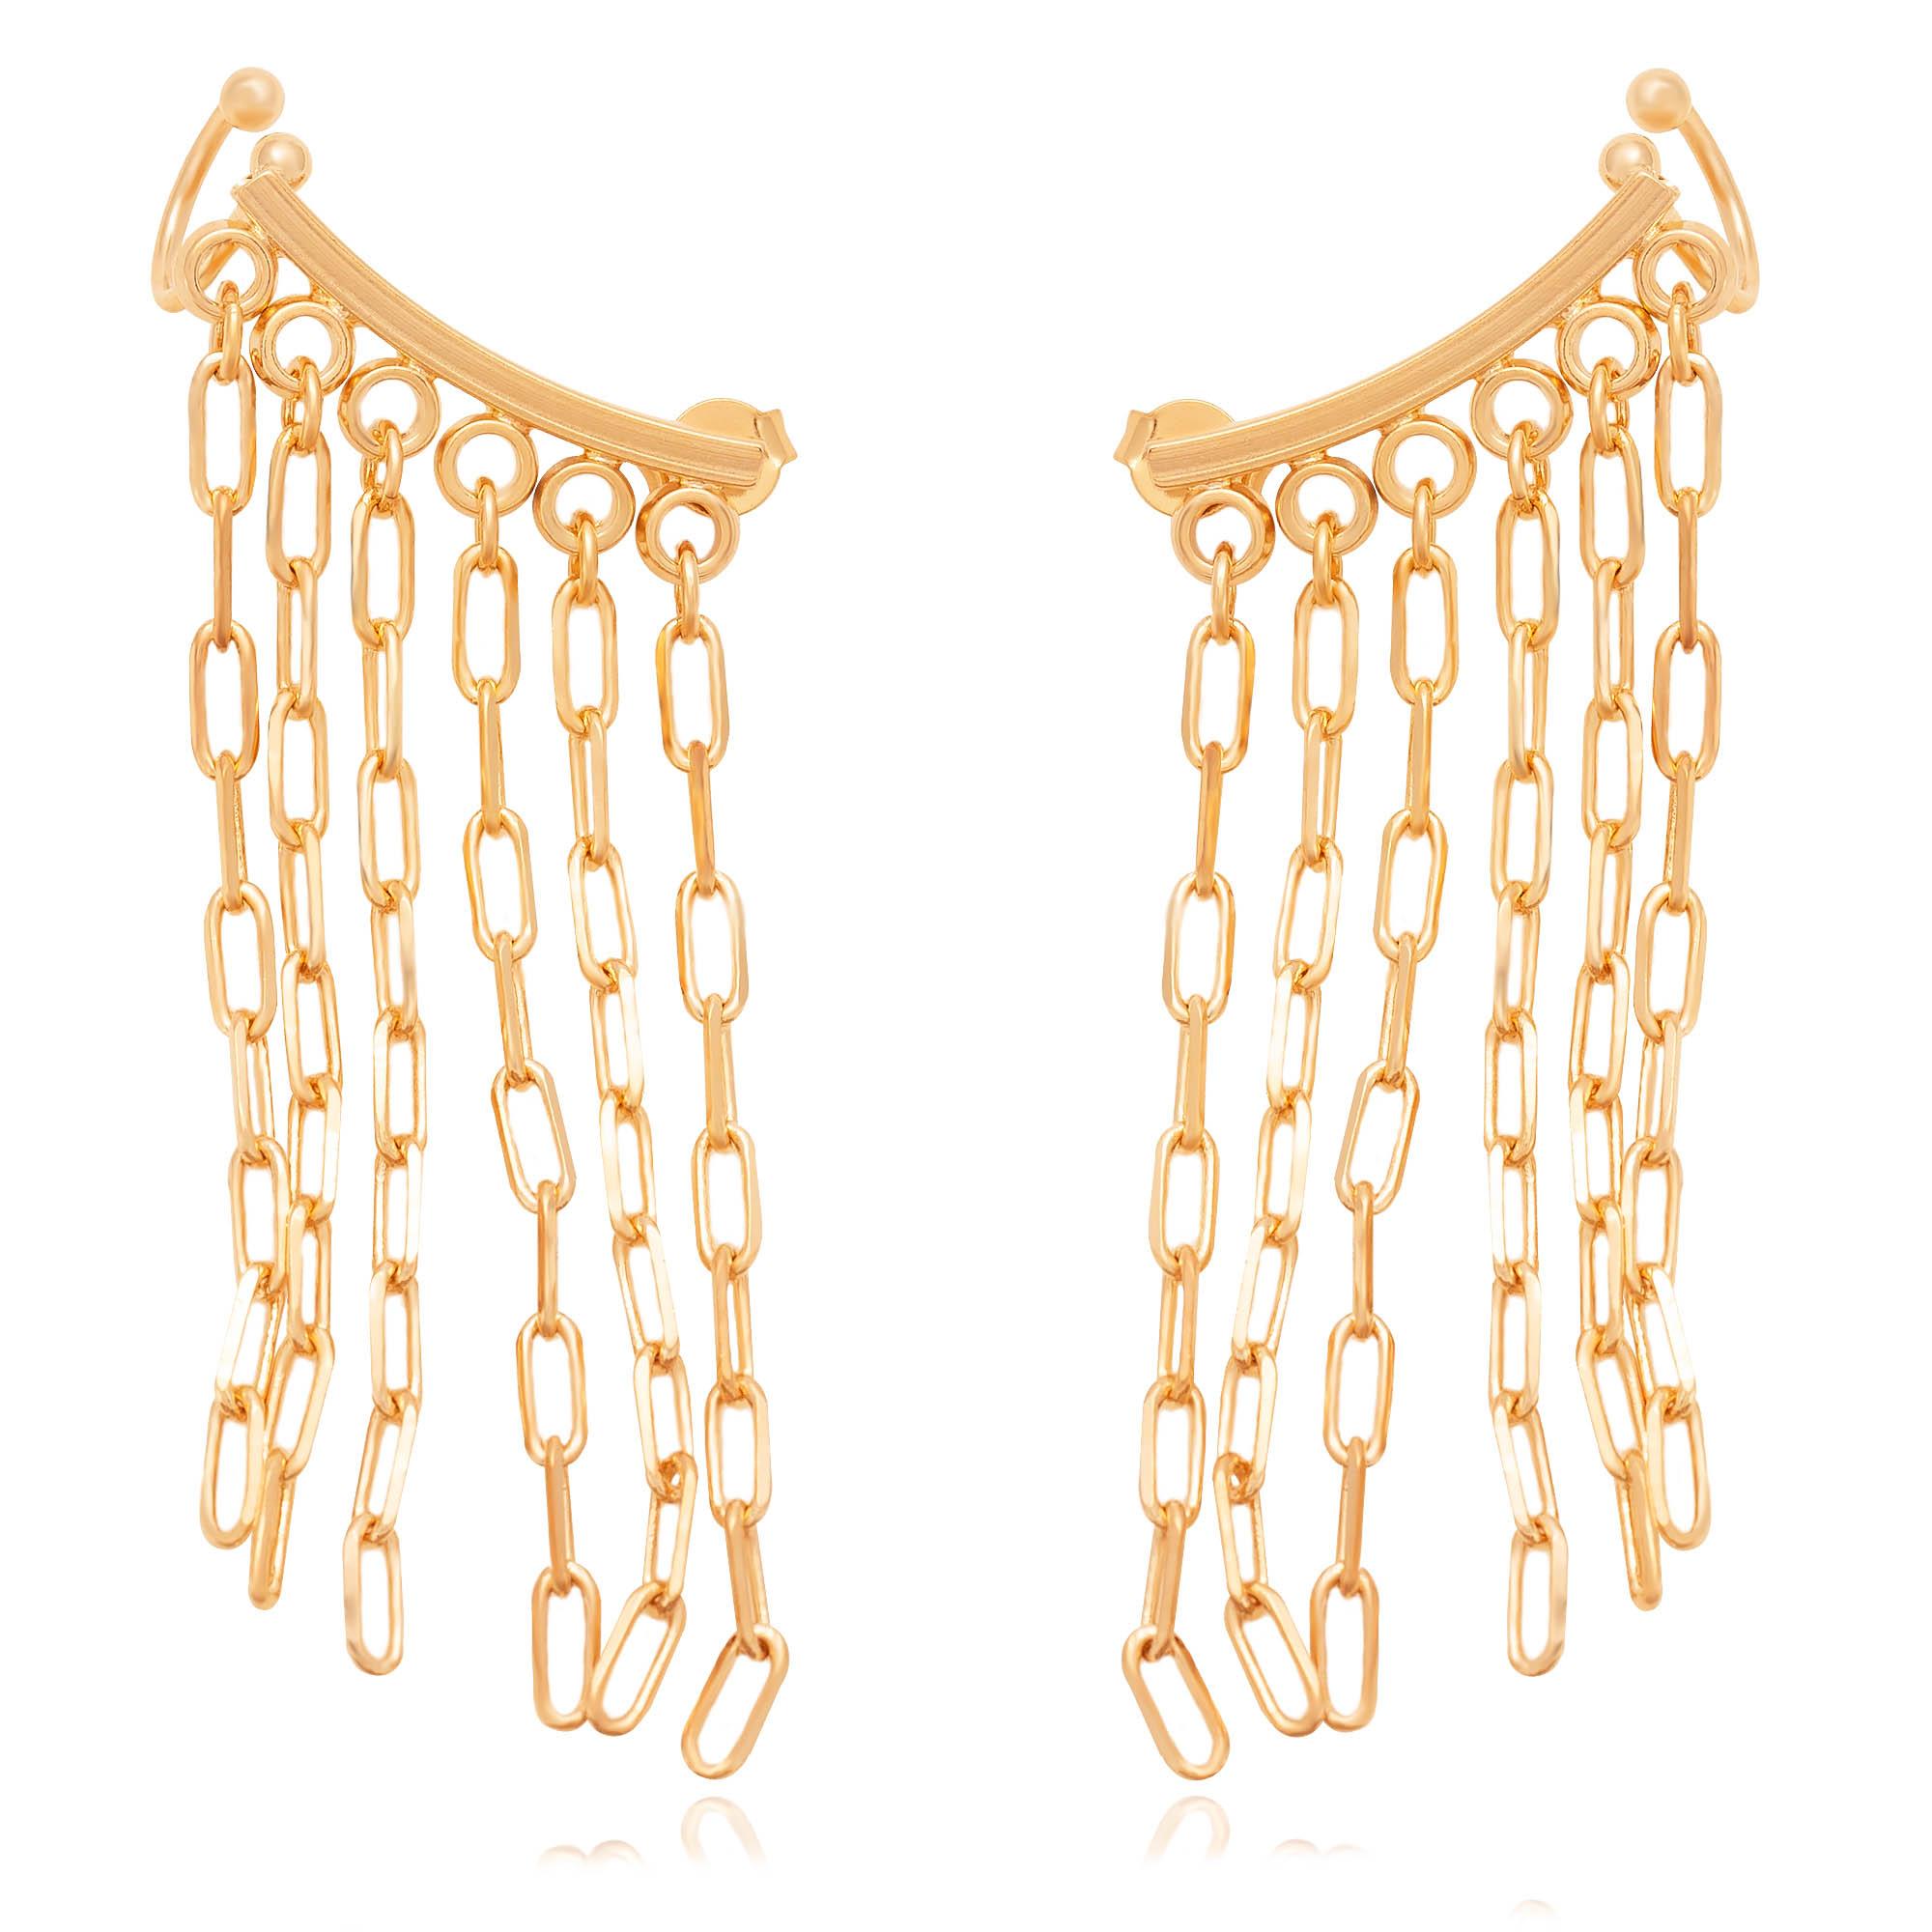 Brinco ear cuff de correntes banhado a ouro 18k  - romabrazil.com.br